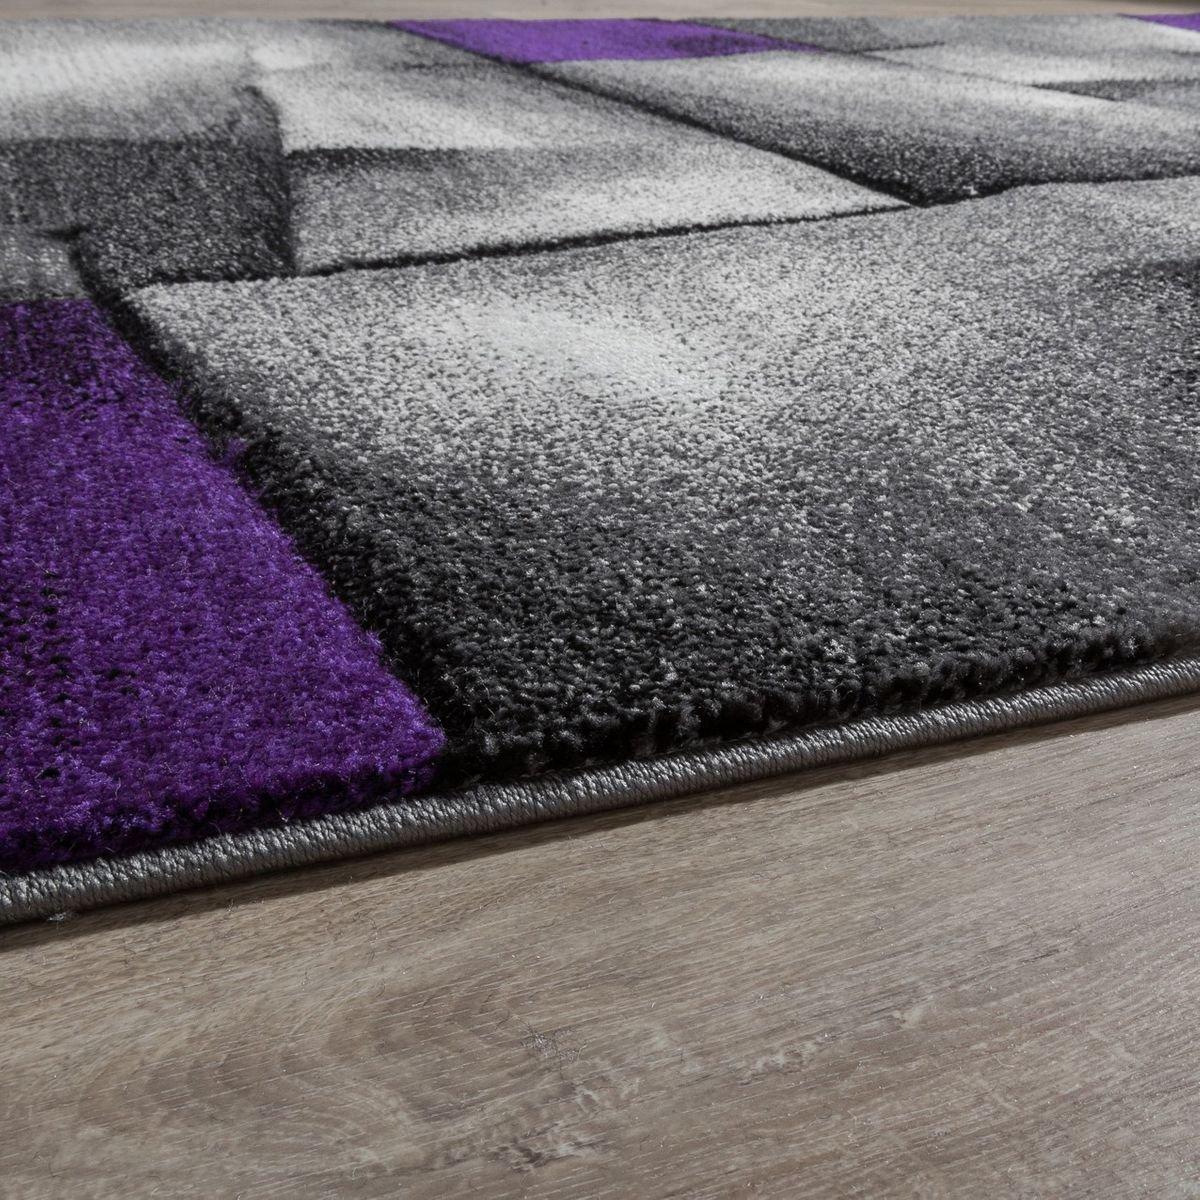 T&T Design Teppich Modern Wohnzimmer Teppiche Karo Lila Grau Grau Grau Konturenschnitt Ausverkauf, Größe 160x230 cm B01N2QHP4Y Teppiche 1ed1e4